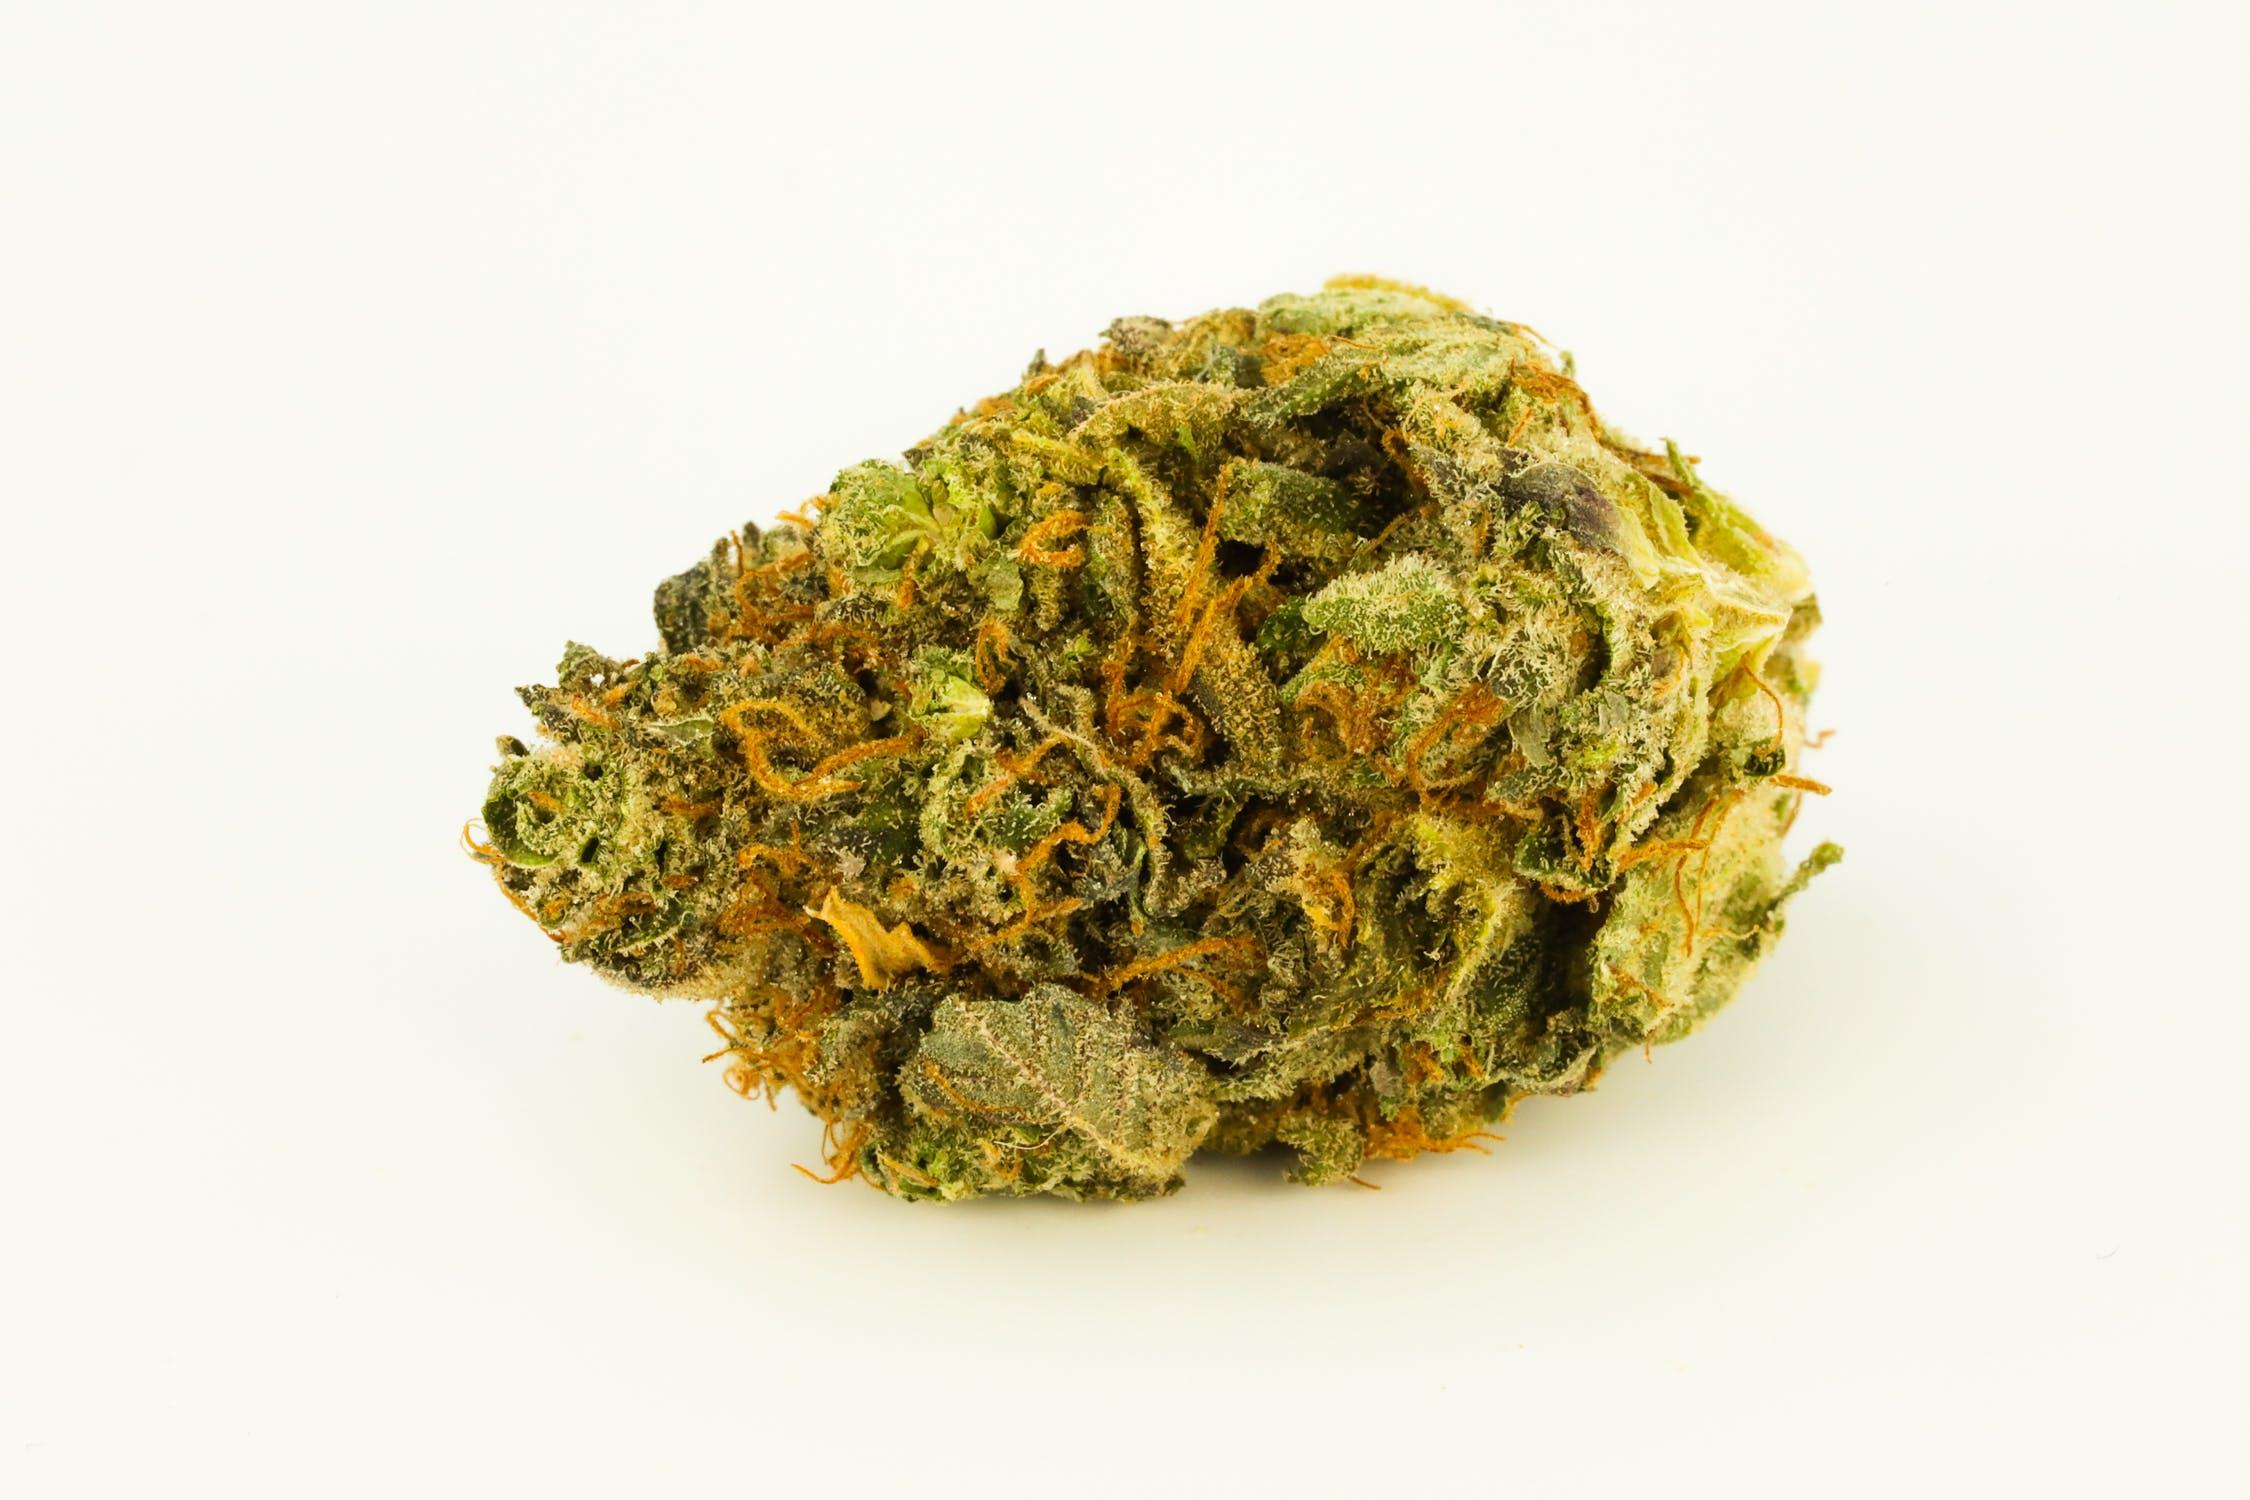 Emerald OG Weed; Emerald OG Cannabis Strain; Emerald OG Indica Marijuana Strain